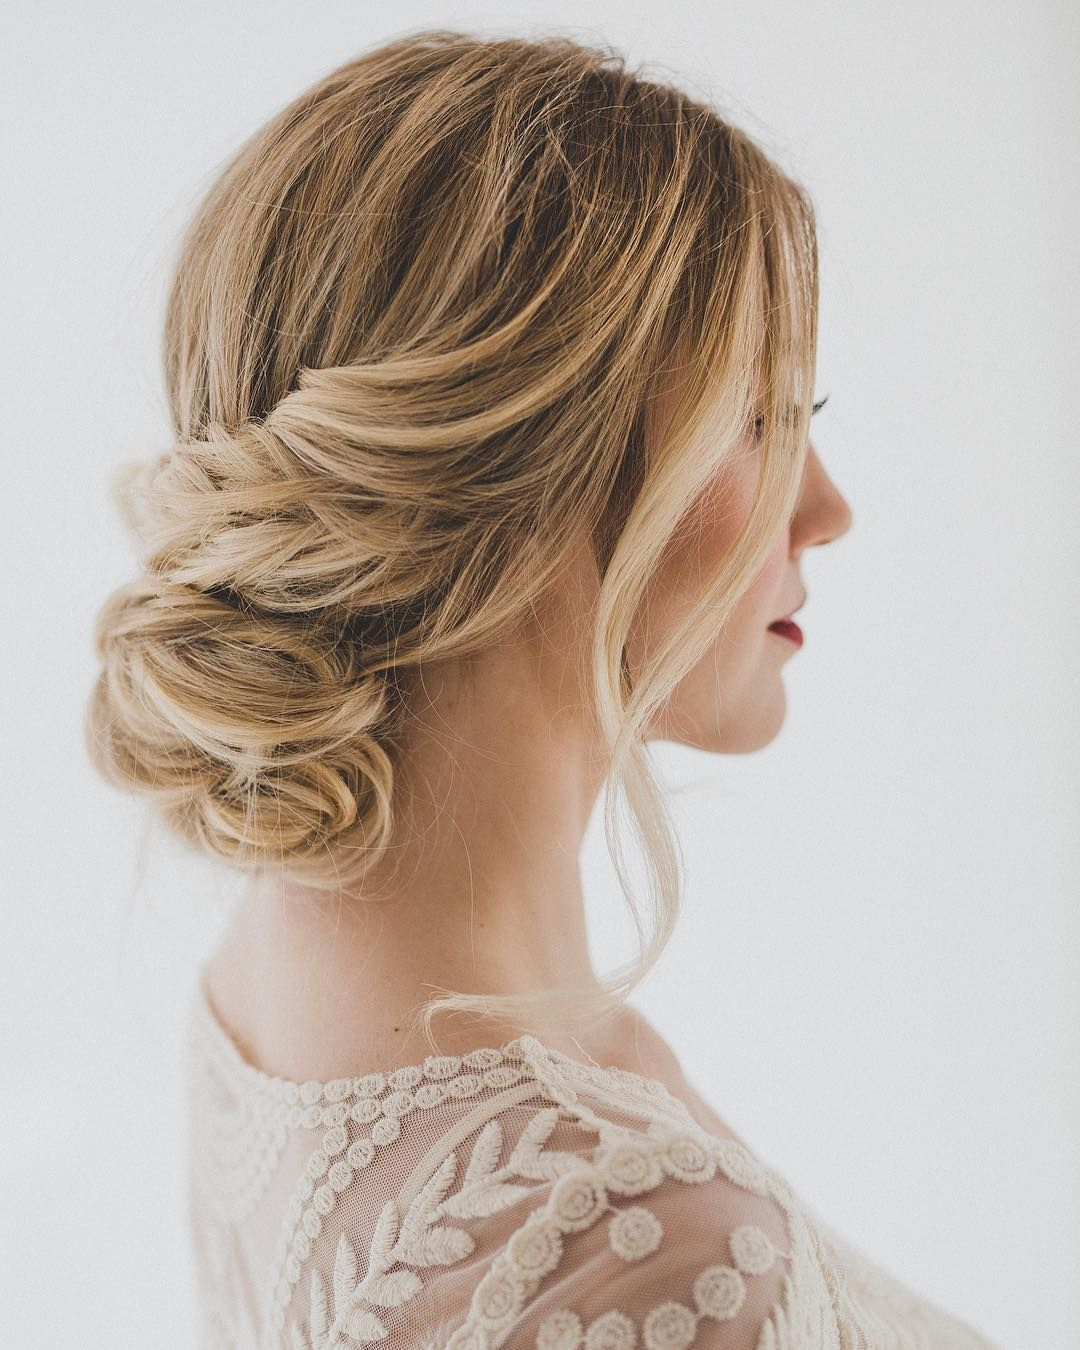 Updo hairstyleupdo wedding hairstyles with pretty detailsupdo